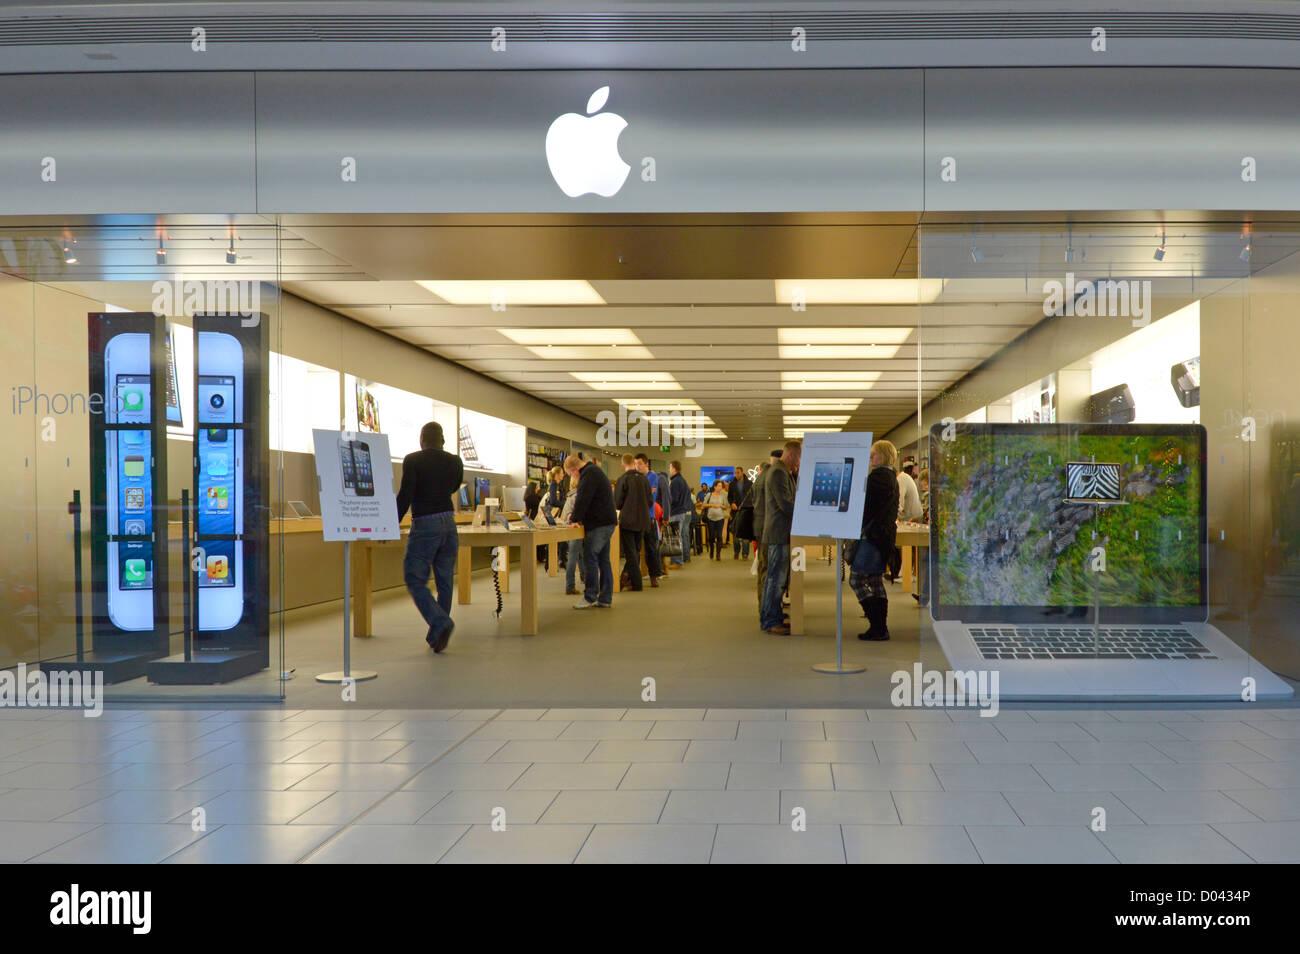 Apple computer online shop